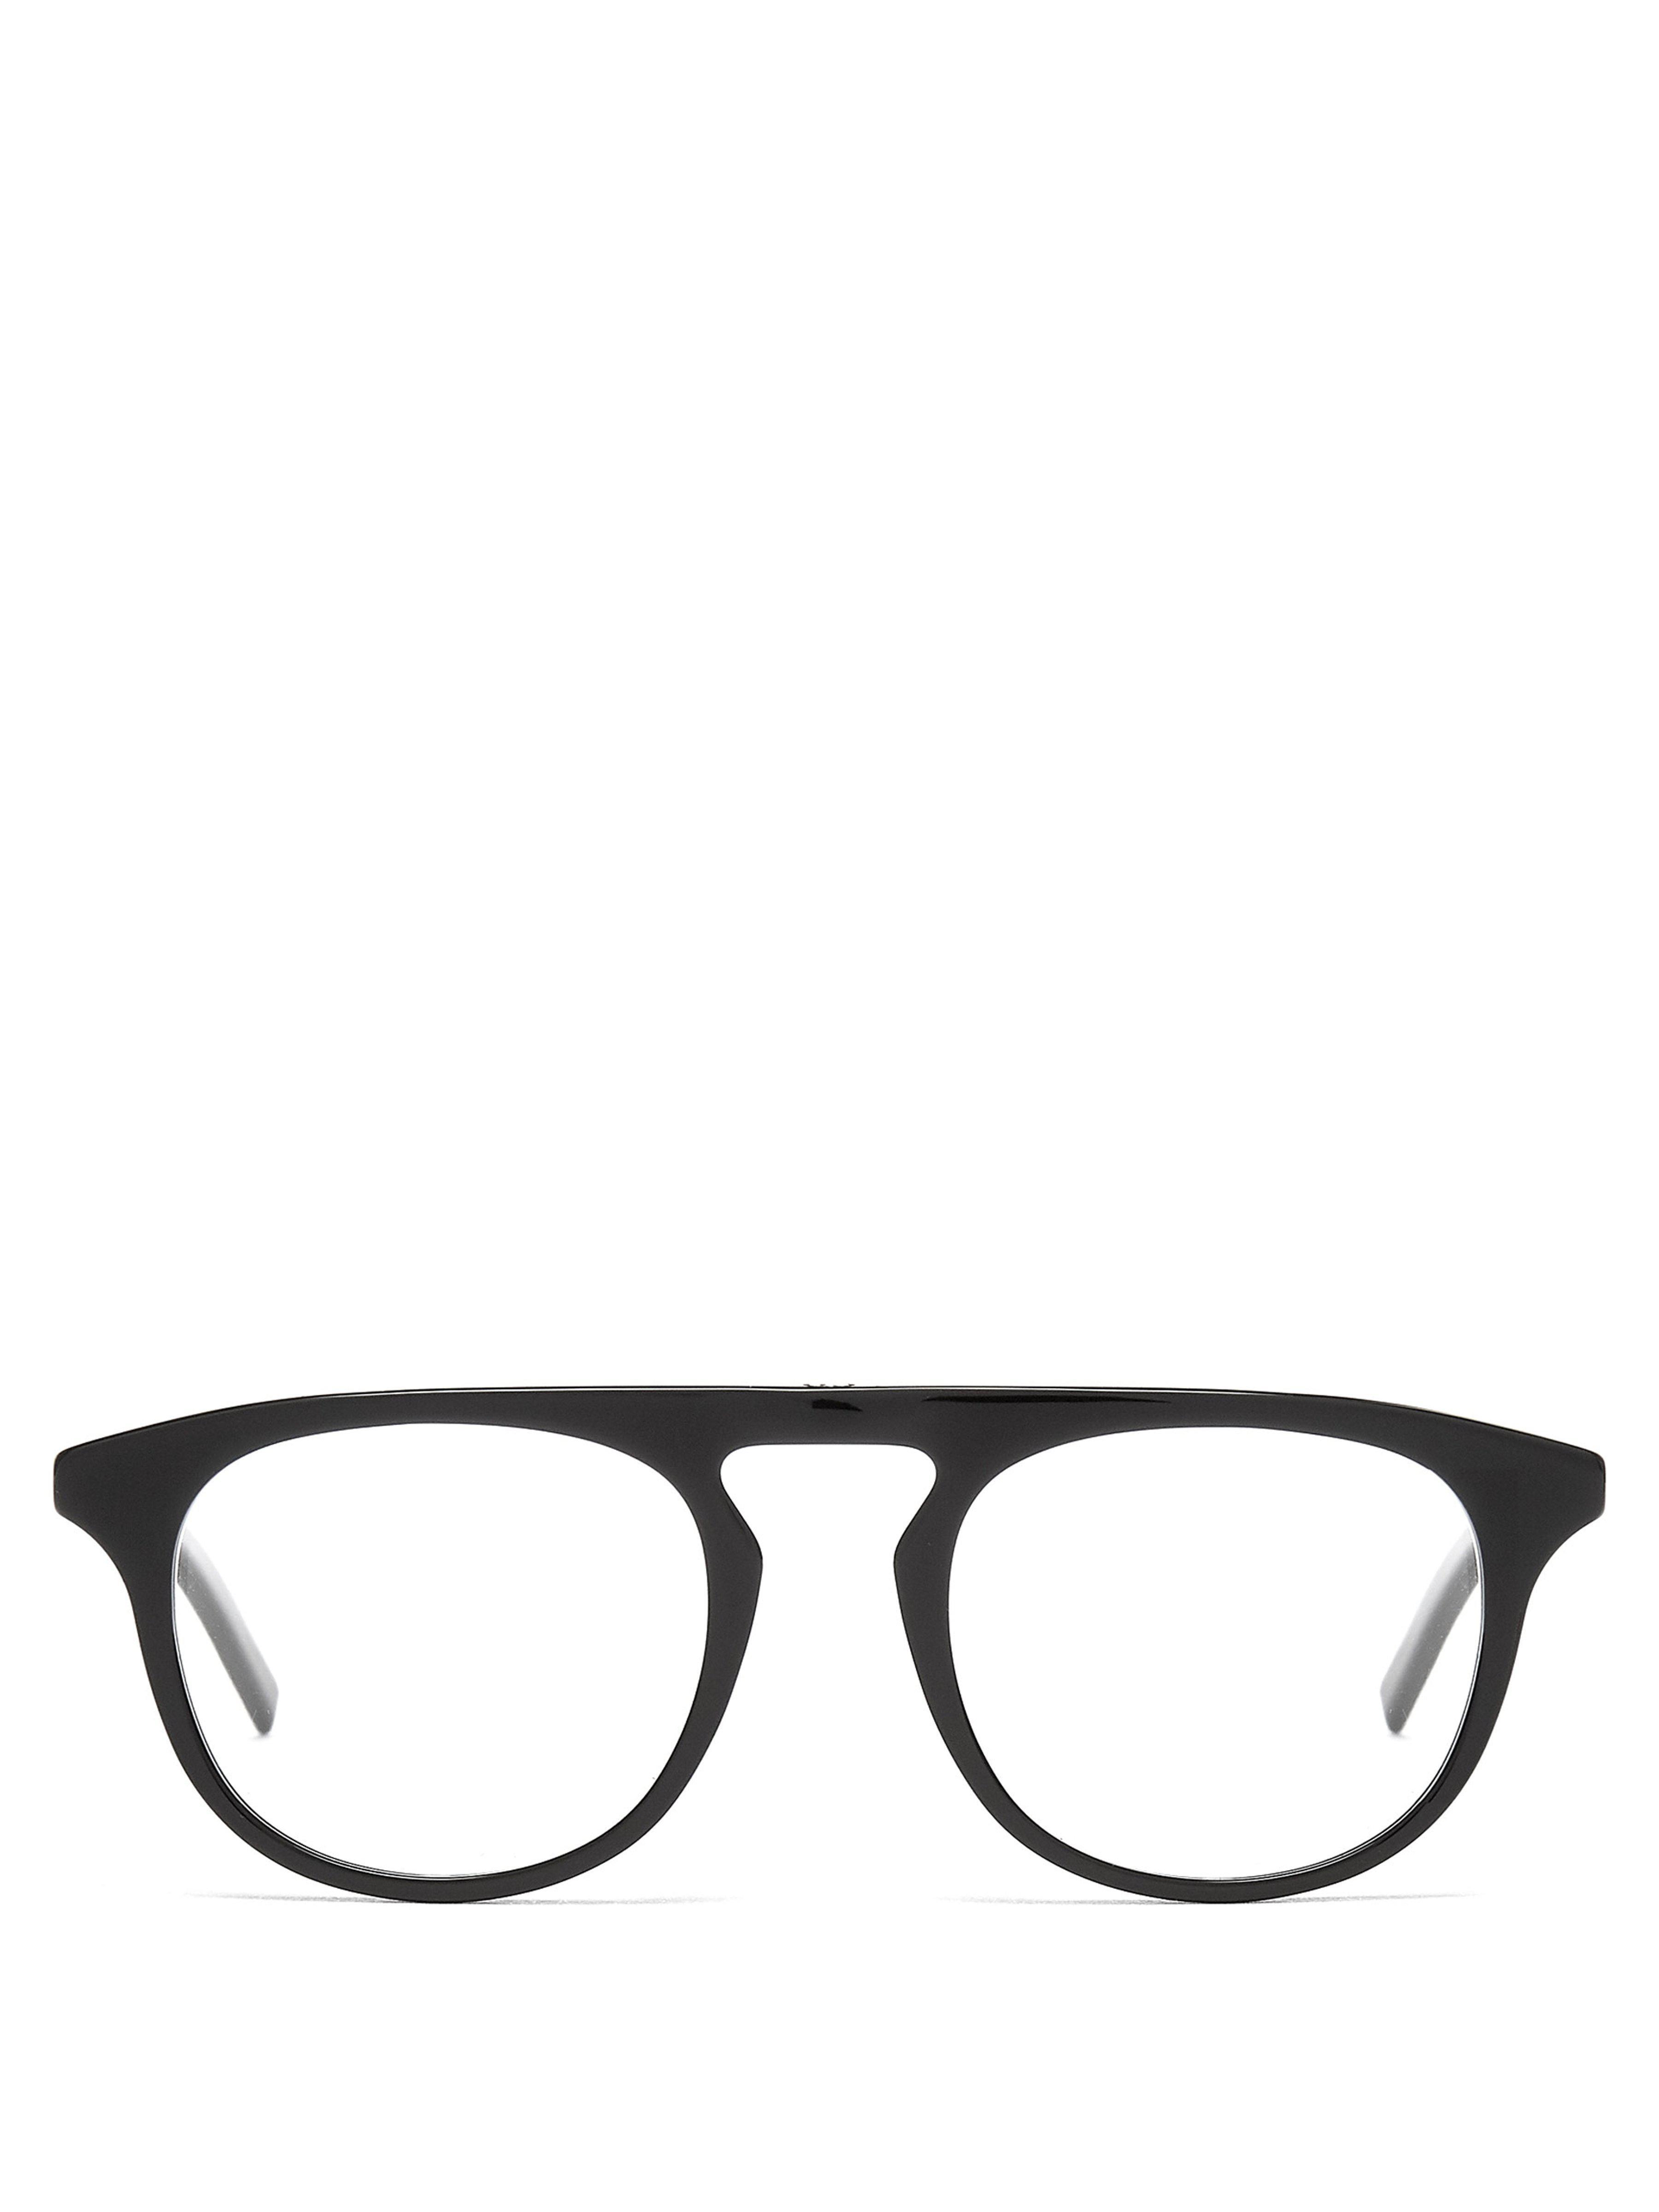 dior homme blacktie pantos frame glasses in black for men lyst  view fullscreen